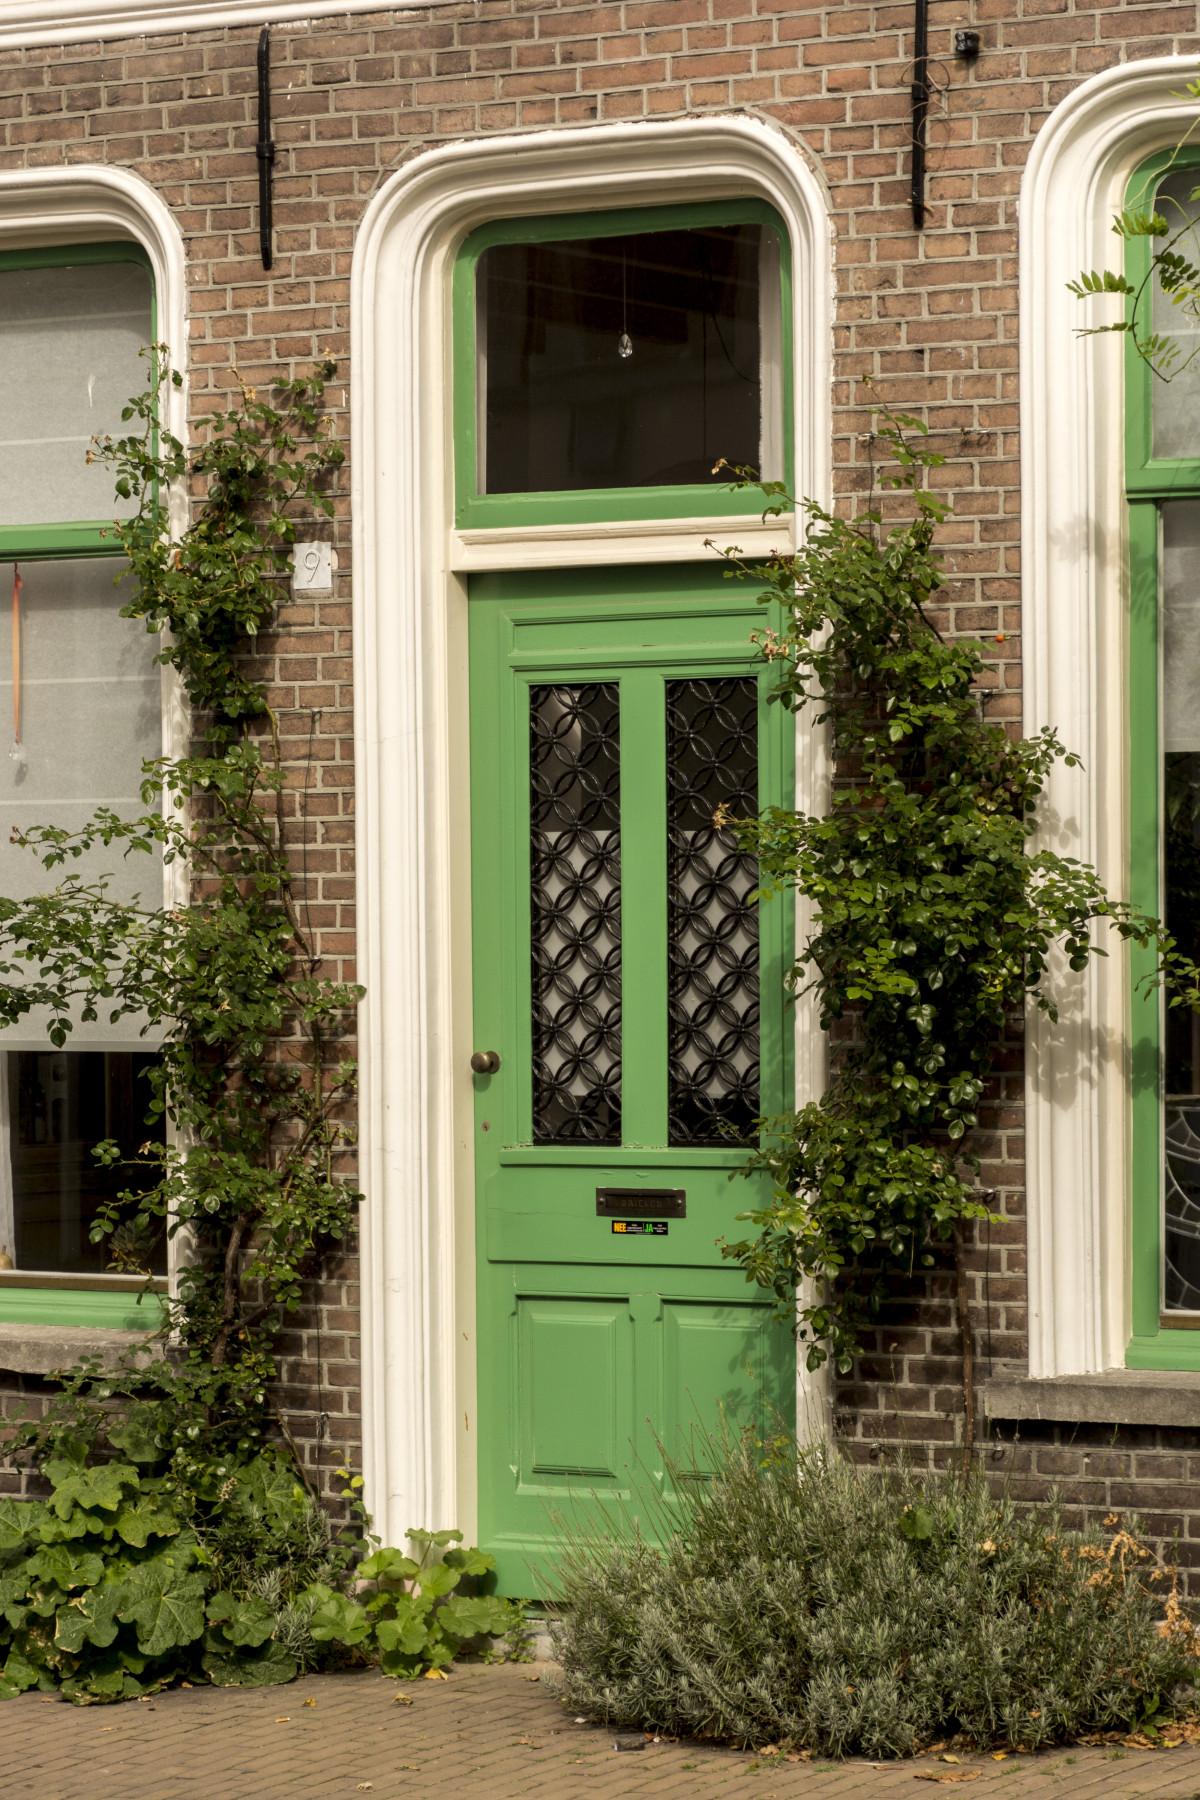 Fotos gratis arquitectura madera c sped casa porche for Jardin al aire libre de madera deco